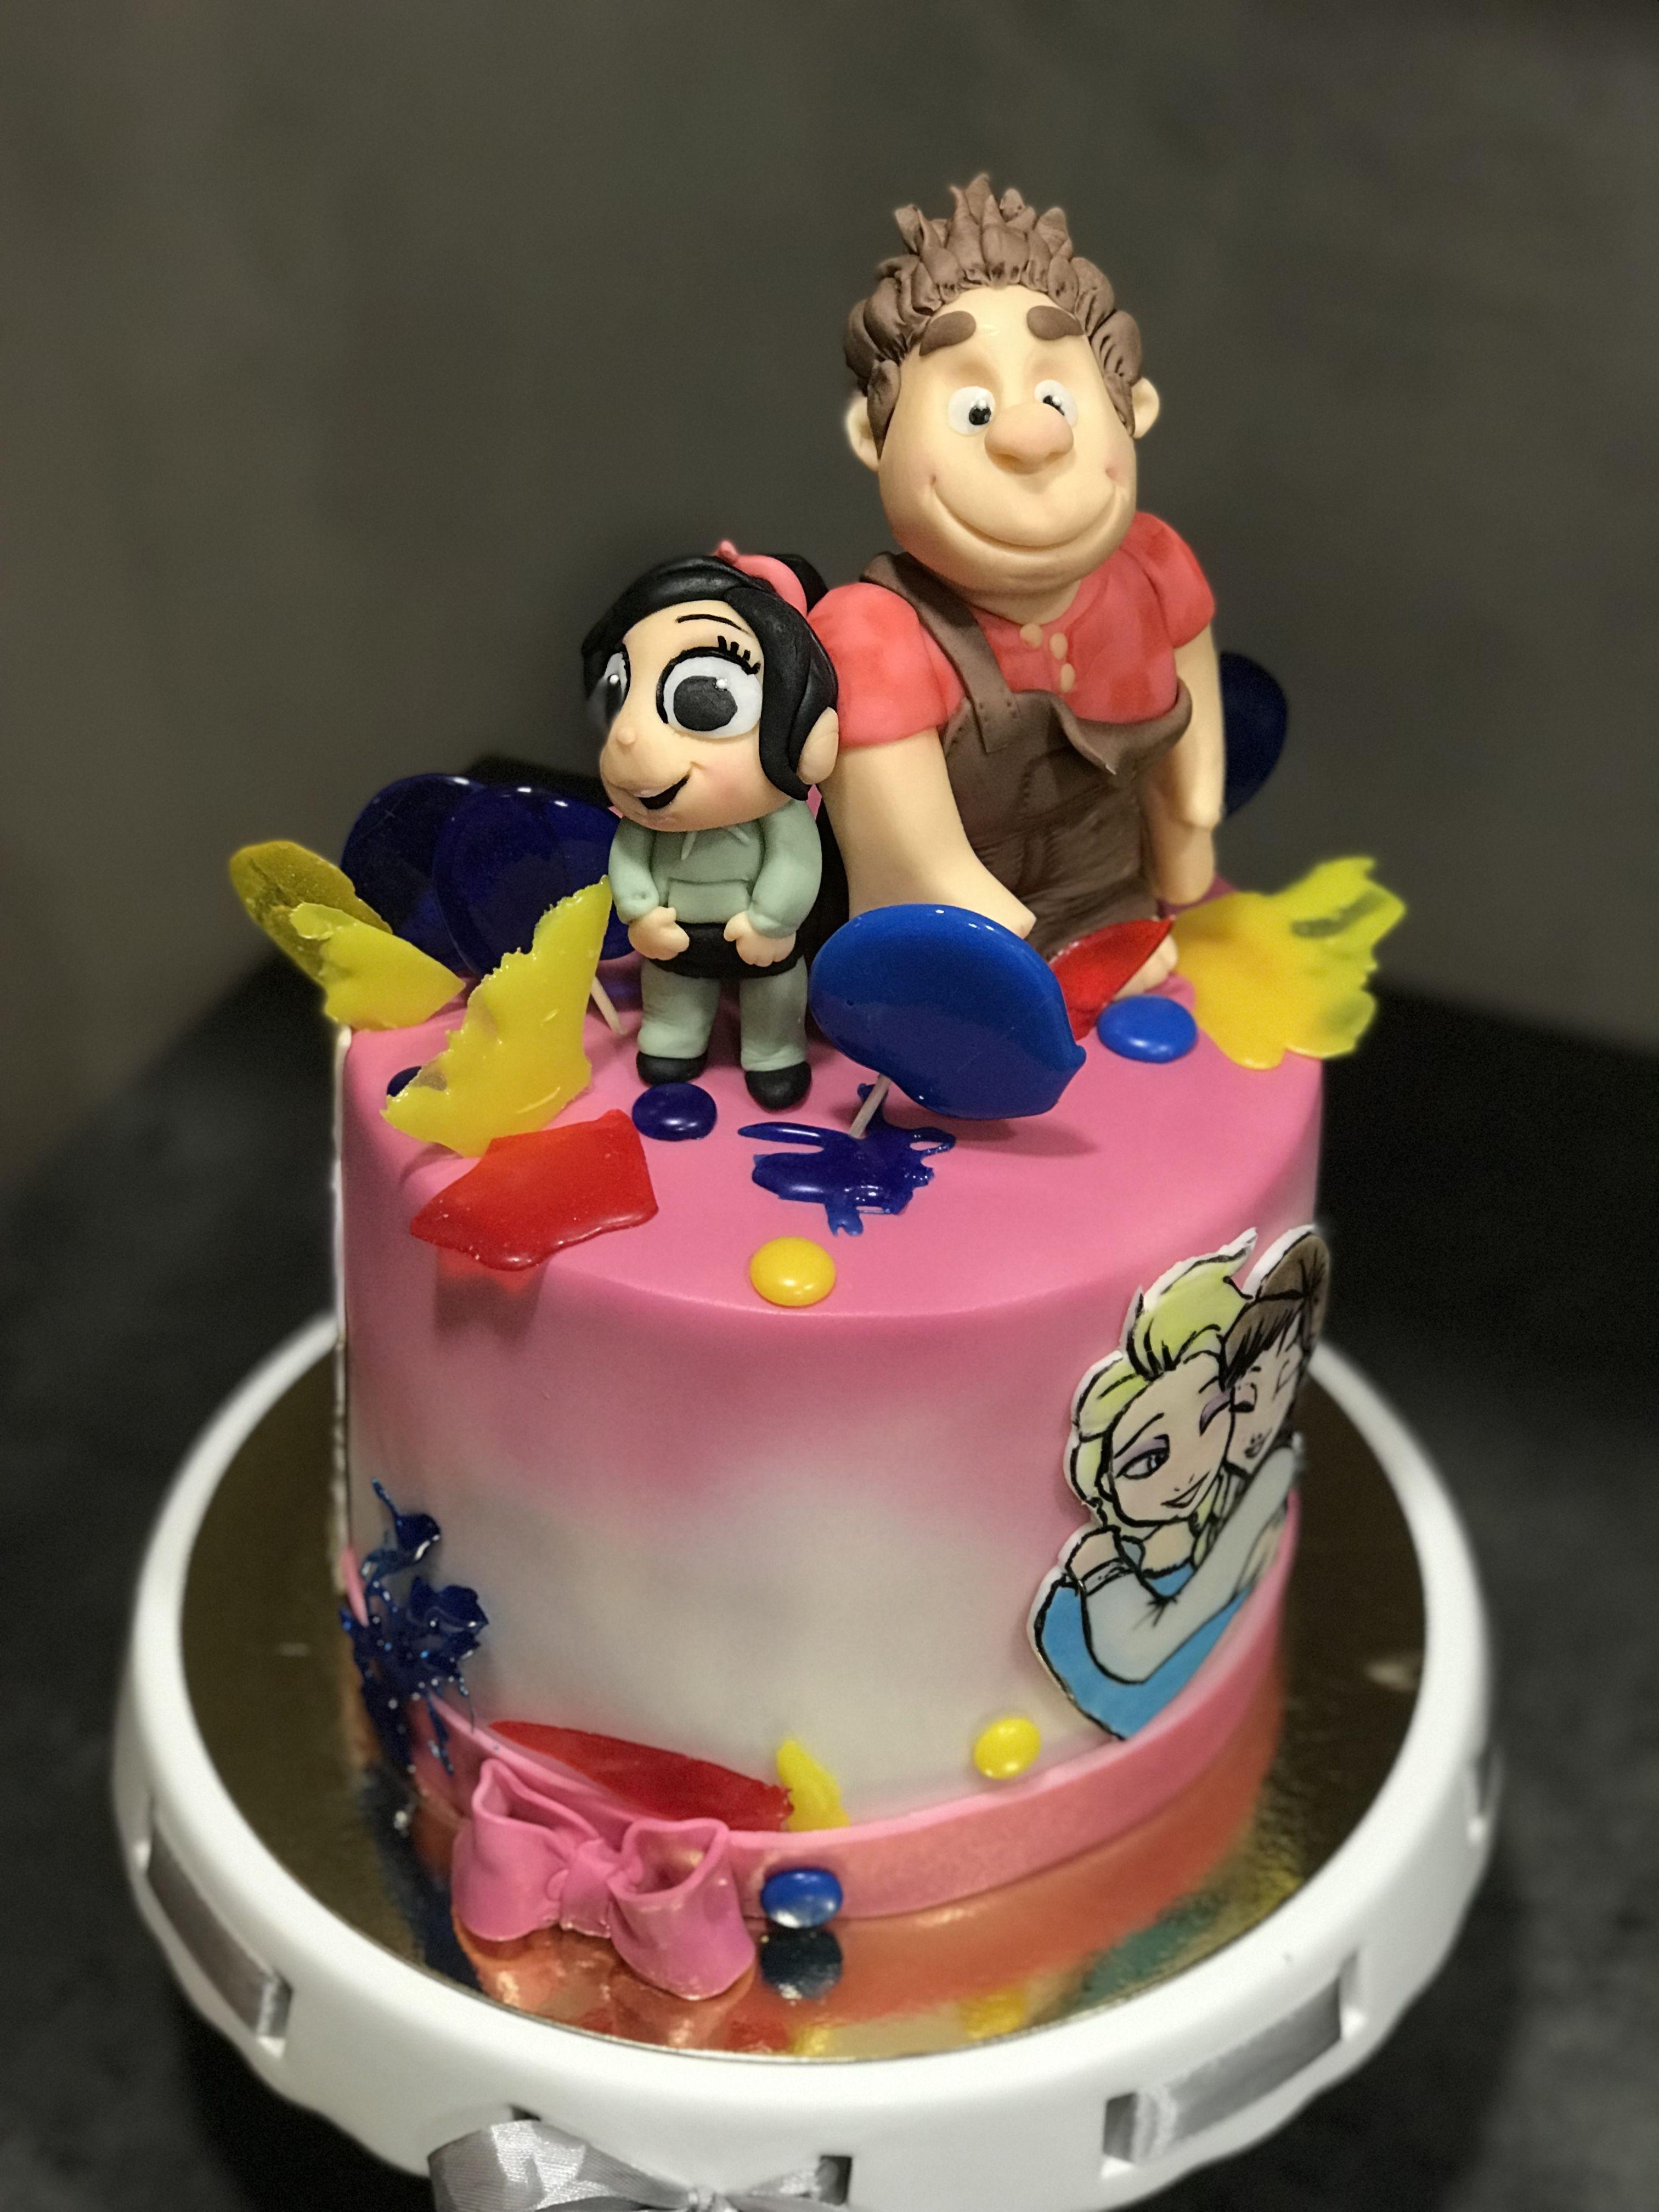 ralph cake Cake, Desserts, Birthday cake